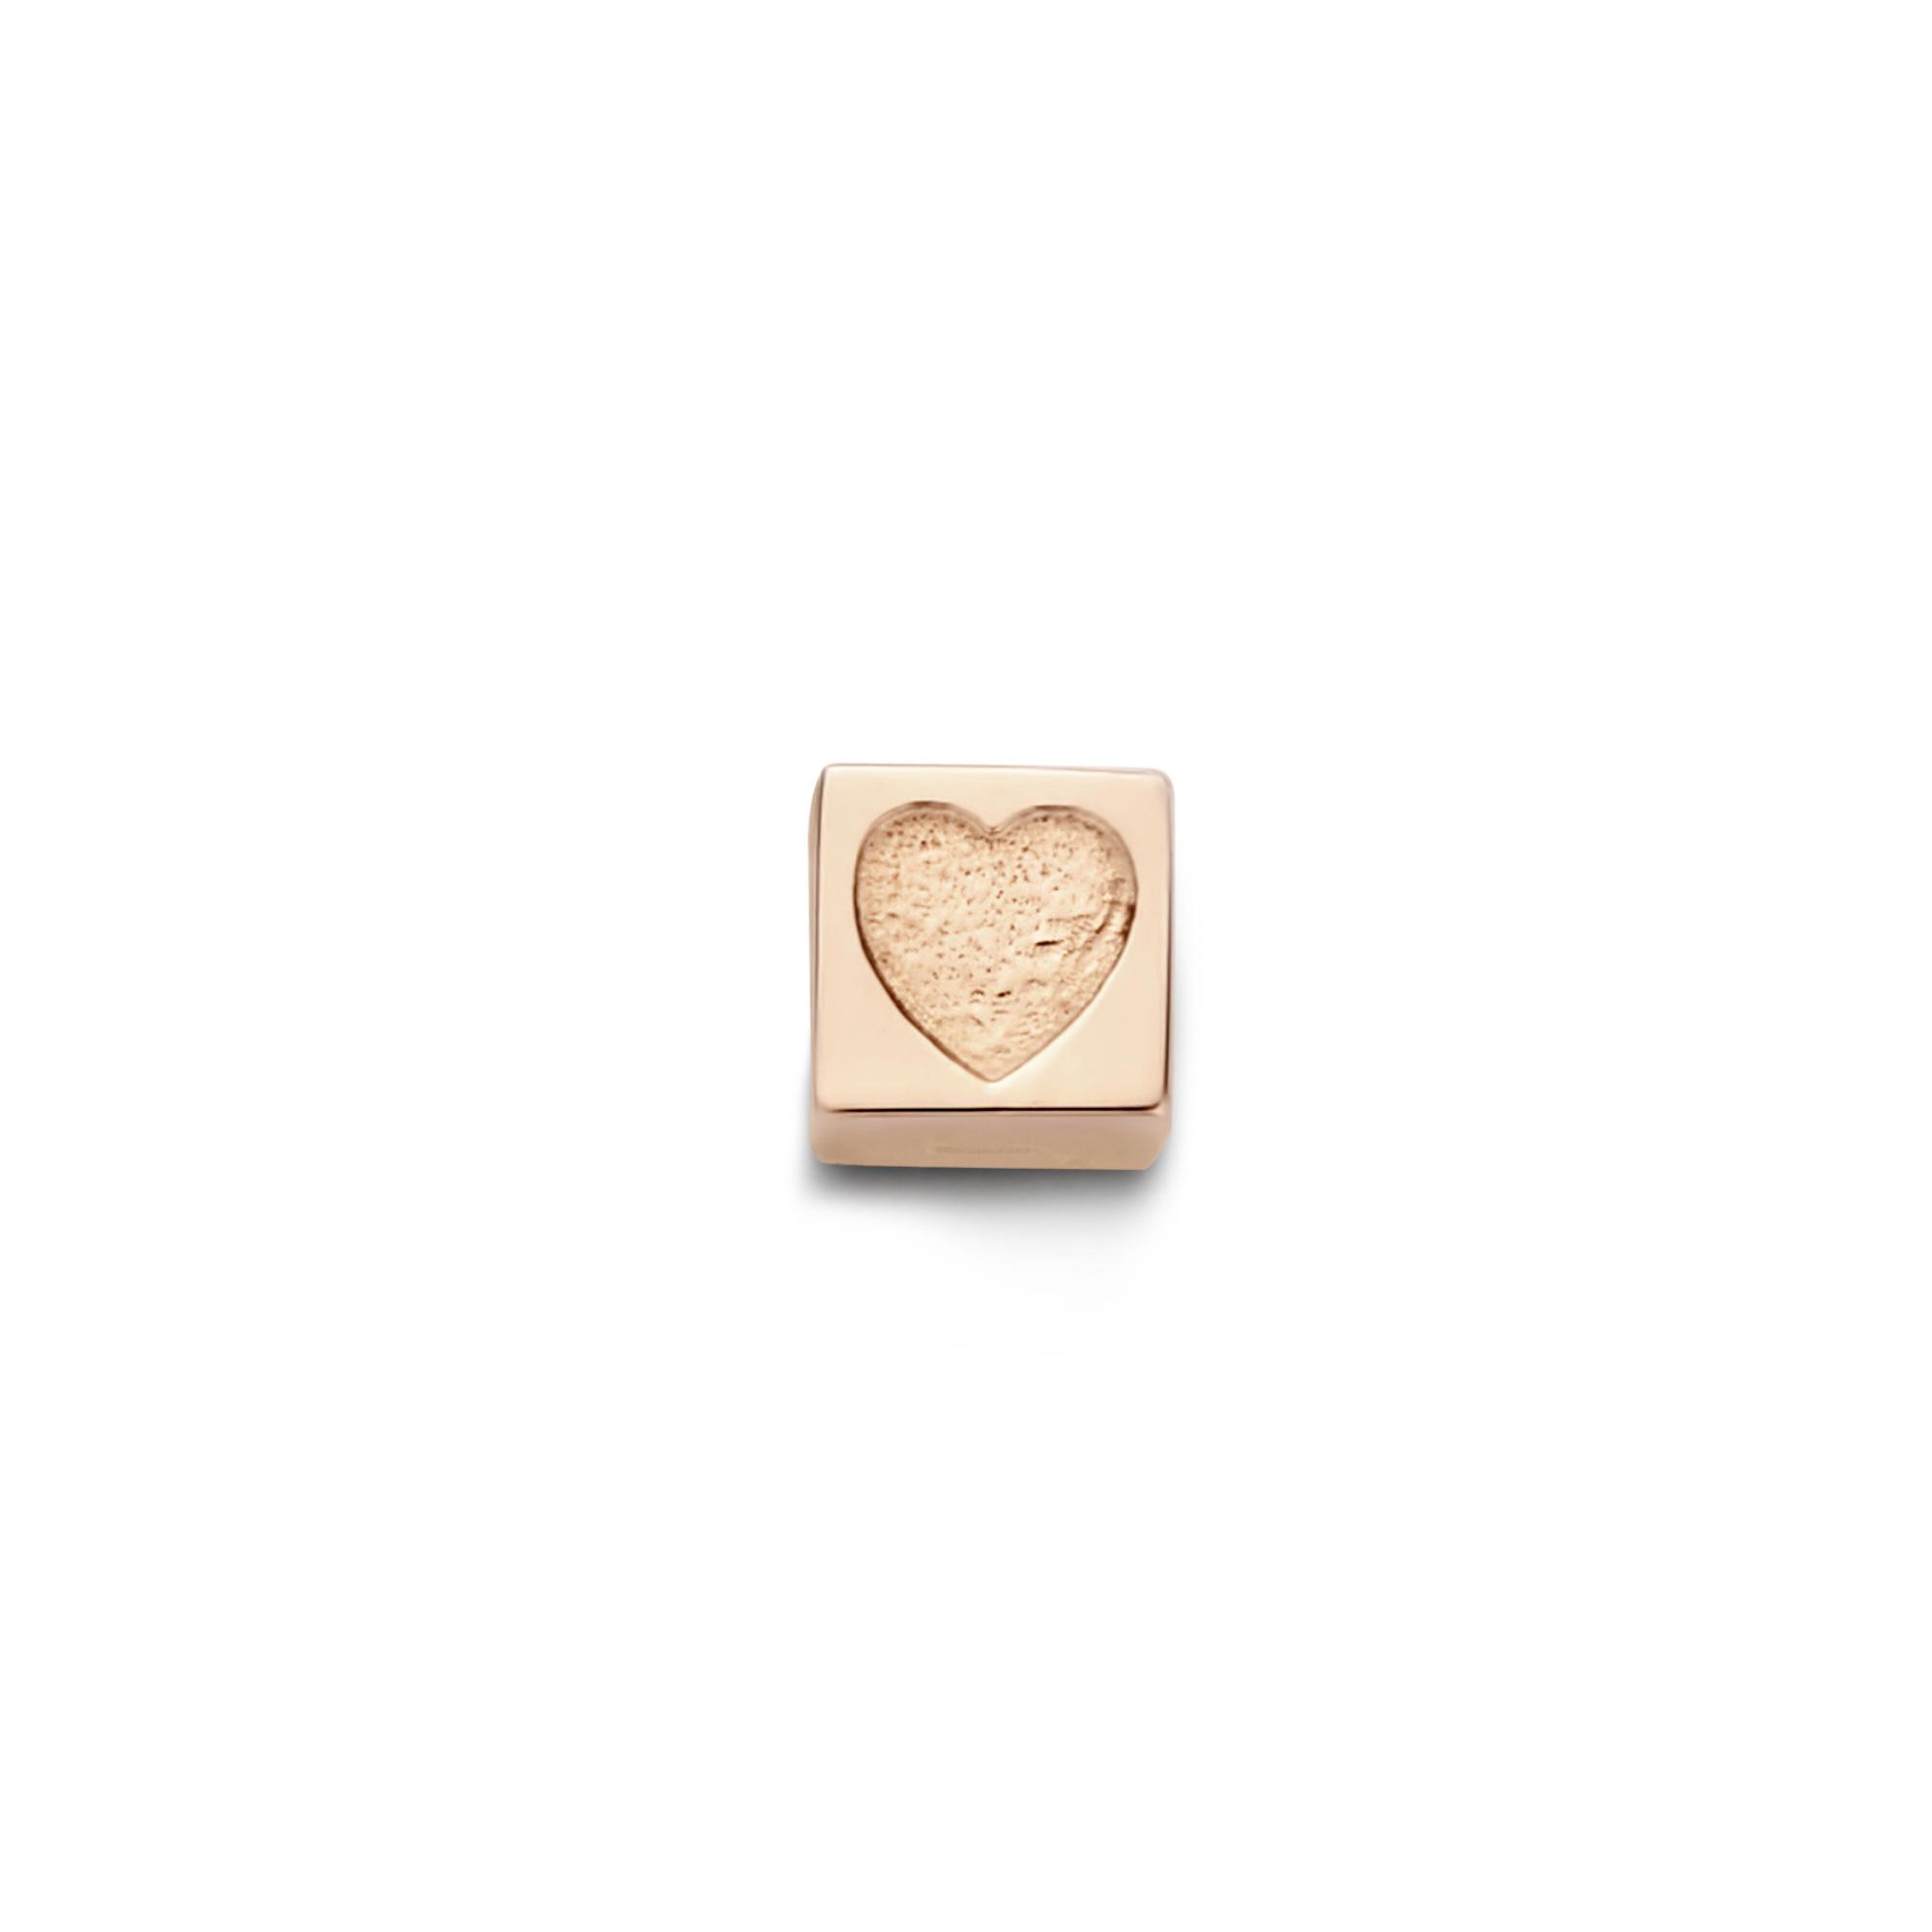 Isabel Bernard La Concorde Felie 14 karat rose gold cube charm with heart